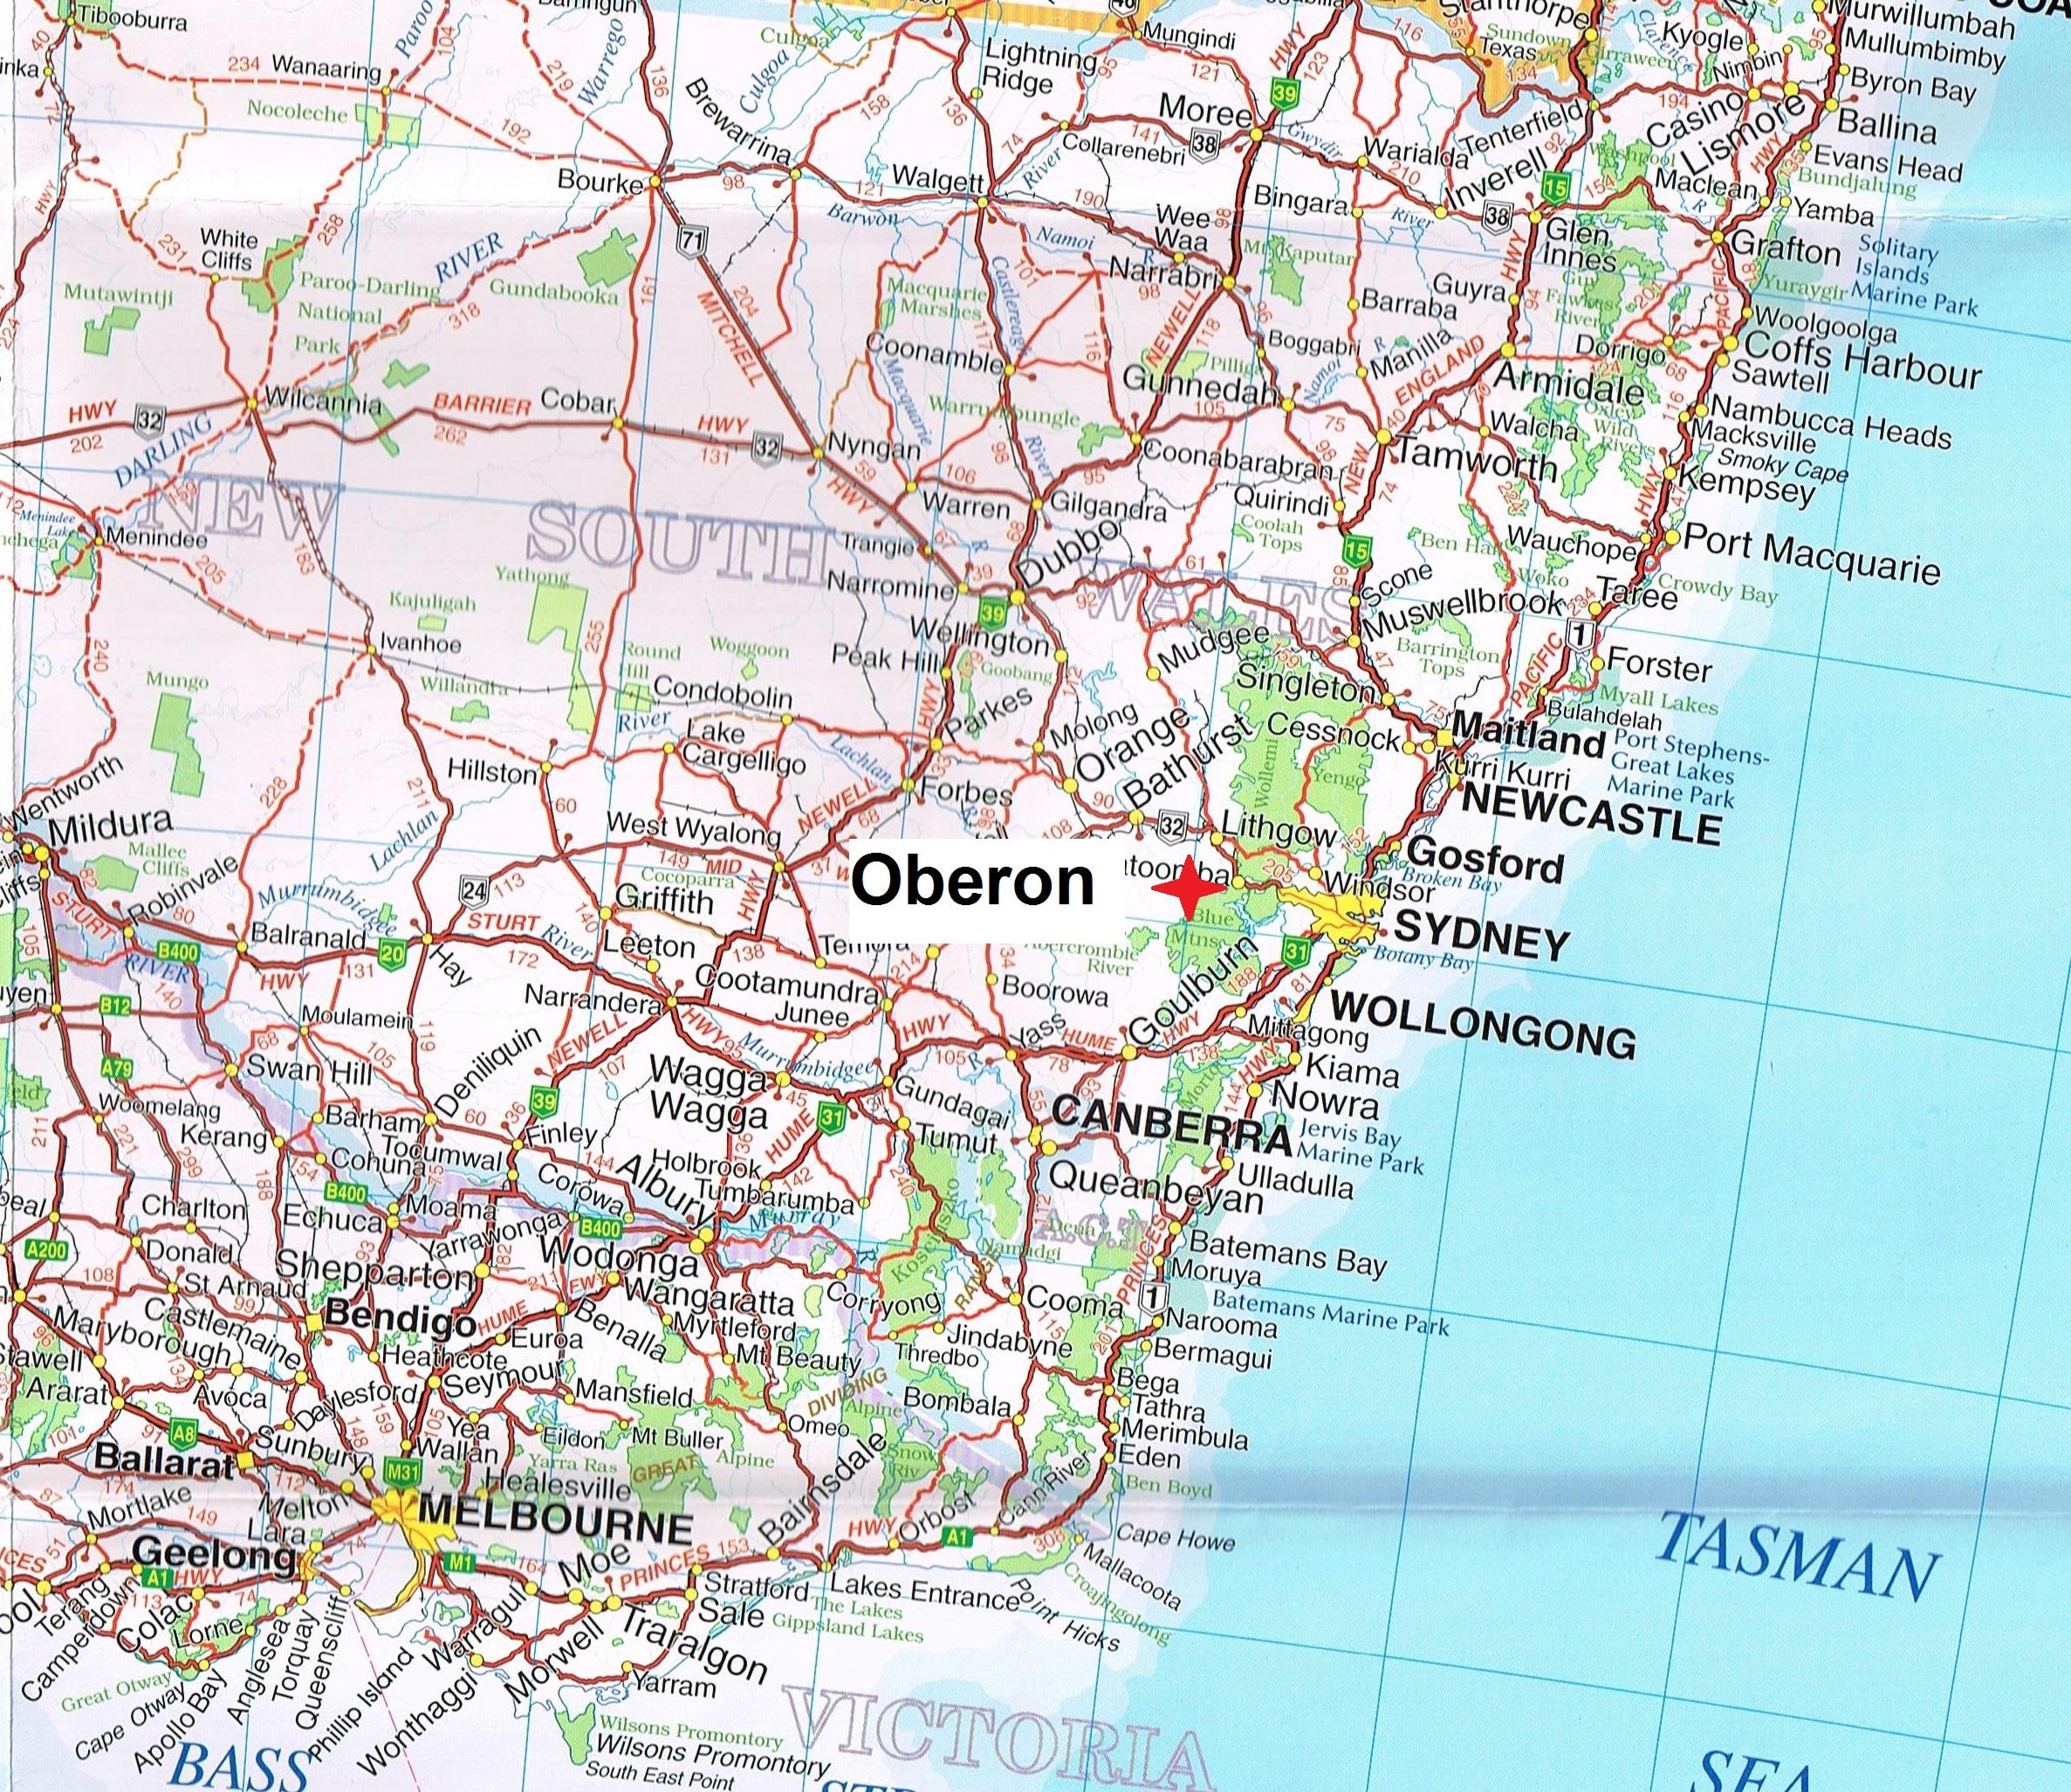 Oberon new south wales